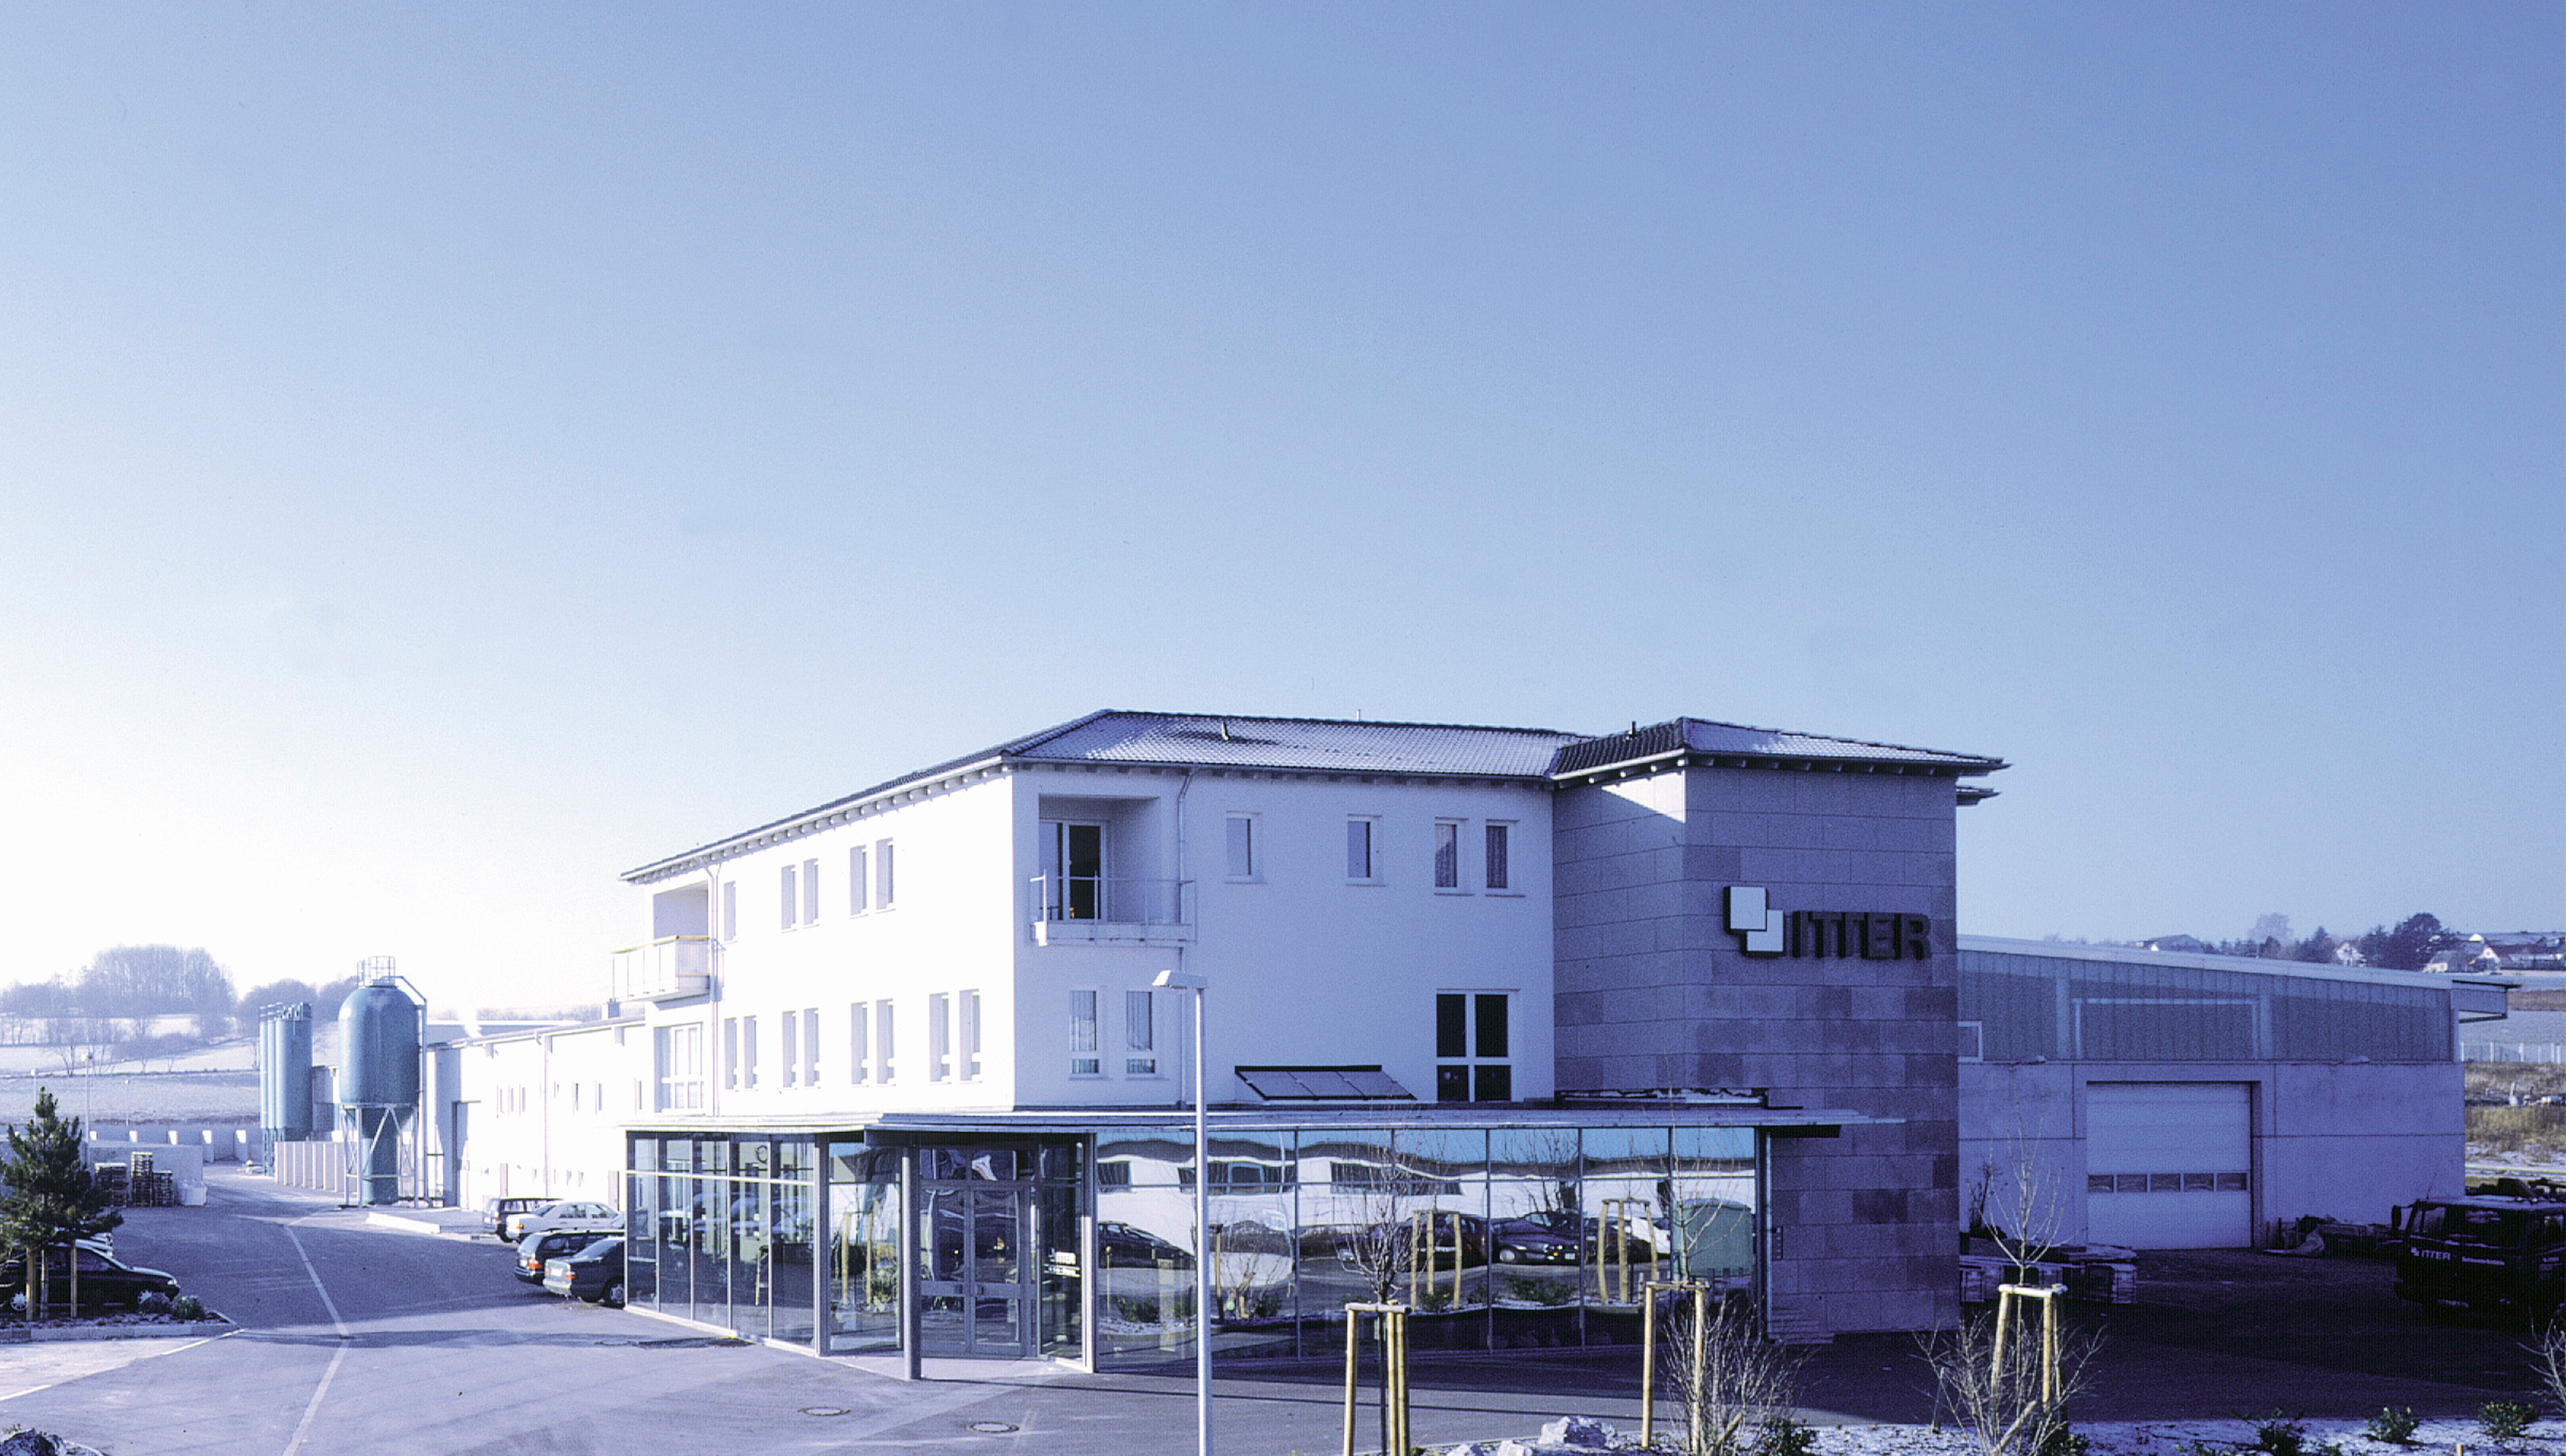 Firmengebäude Itter GmbH Marmor, Granit, Betonwerkstein